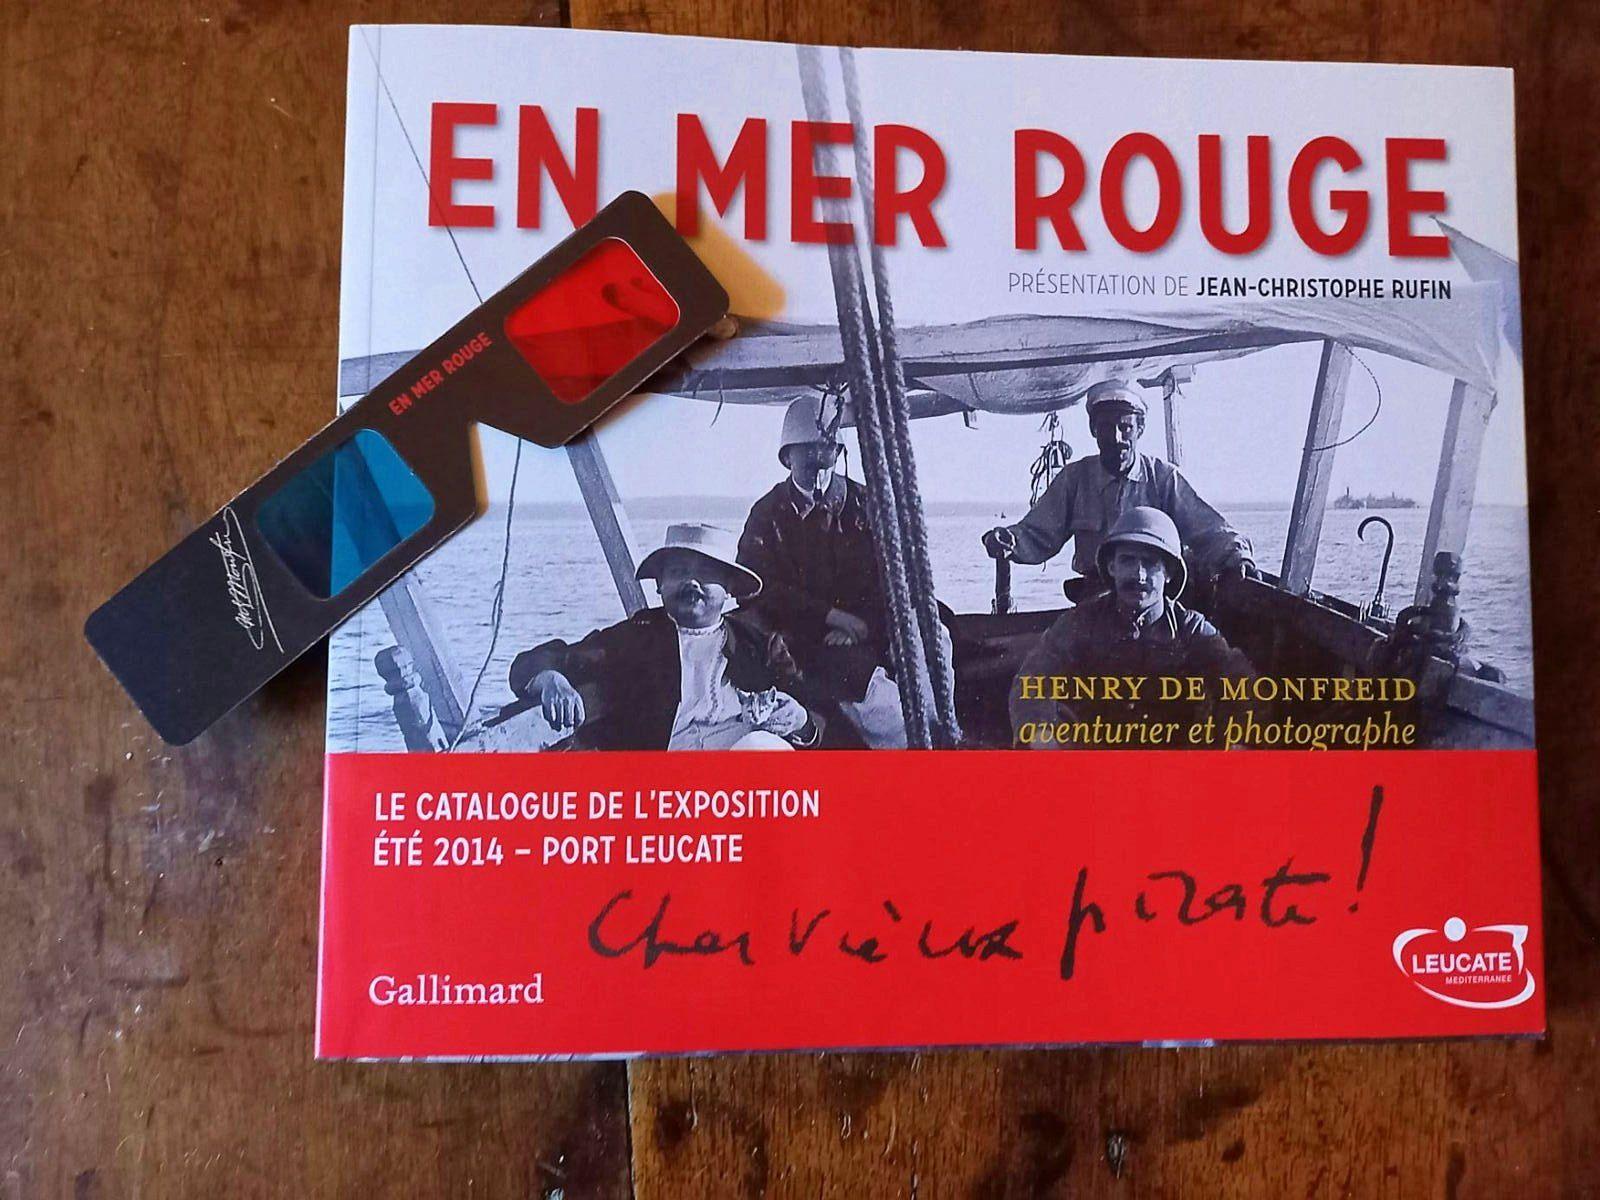 Henry de Monfreid aventurier photographe Livre Expo 2014Port Leucate